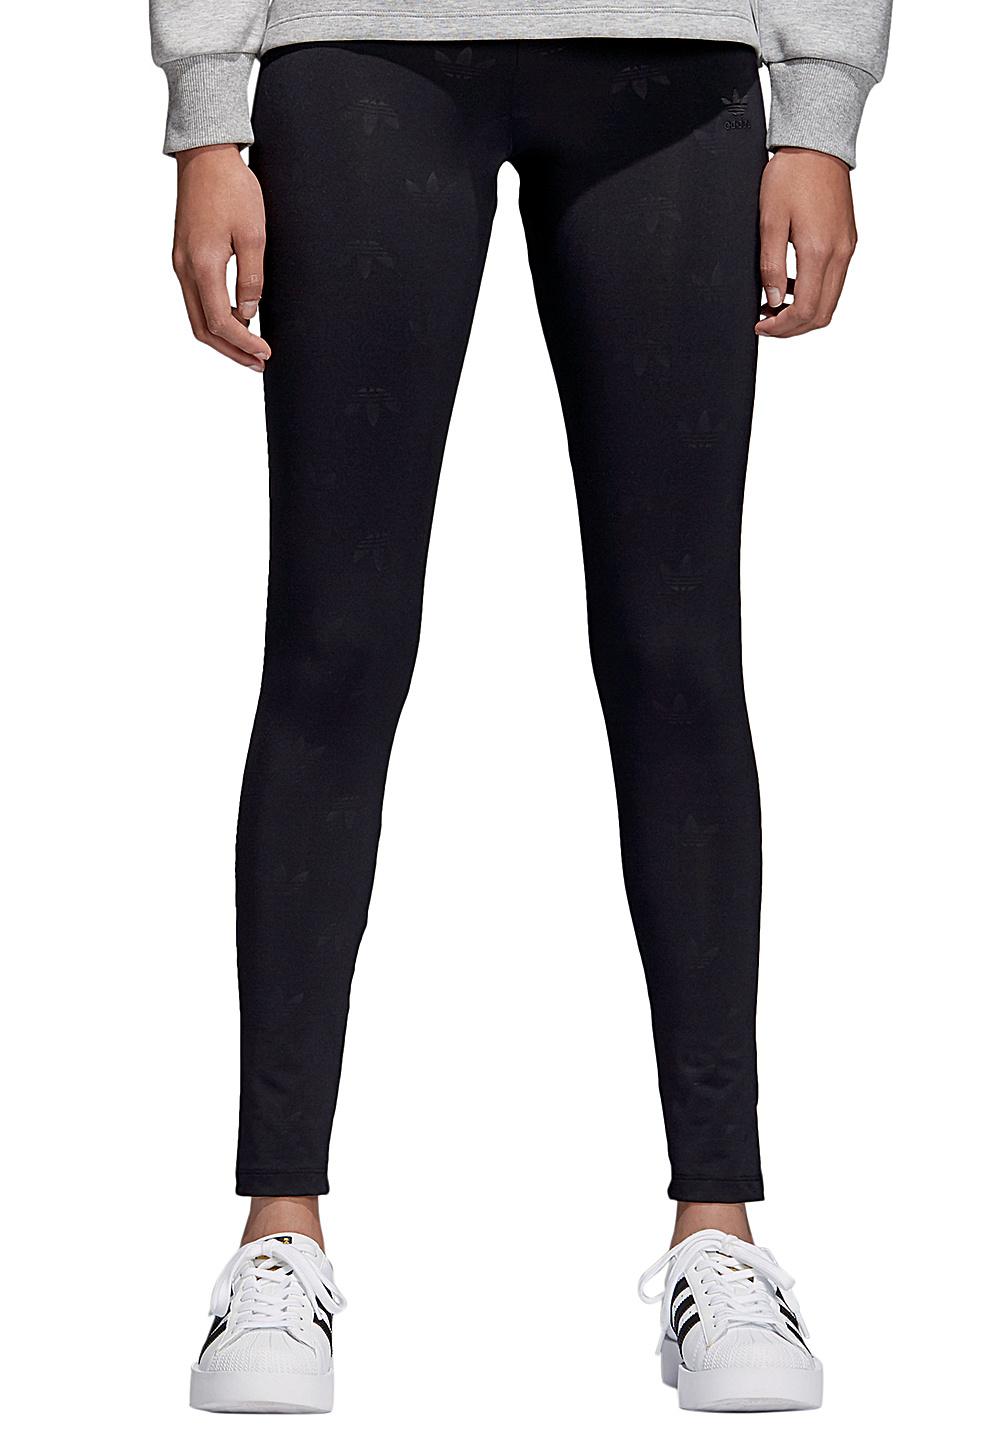 adidas-tight-leggings-femmes-noirs